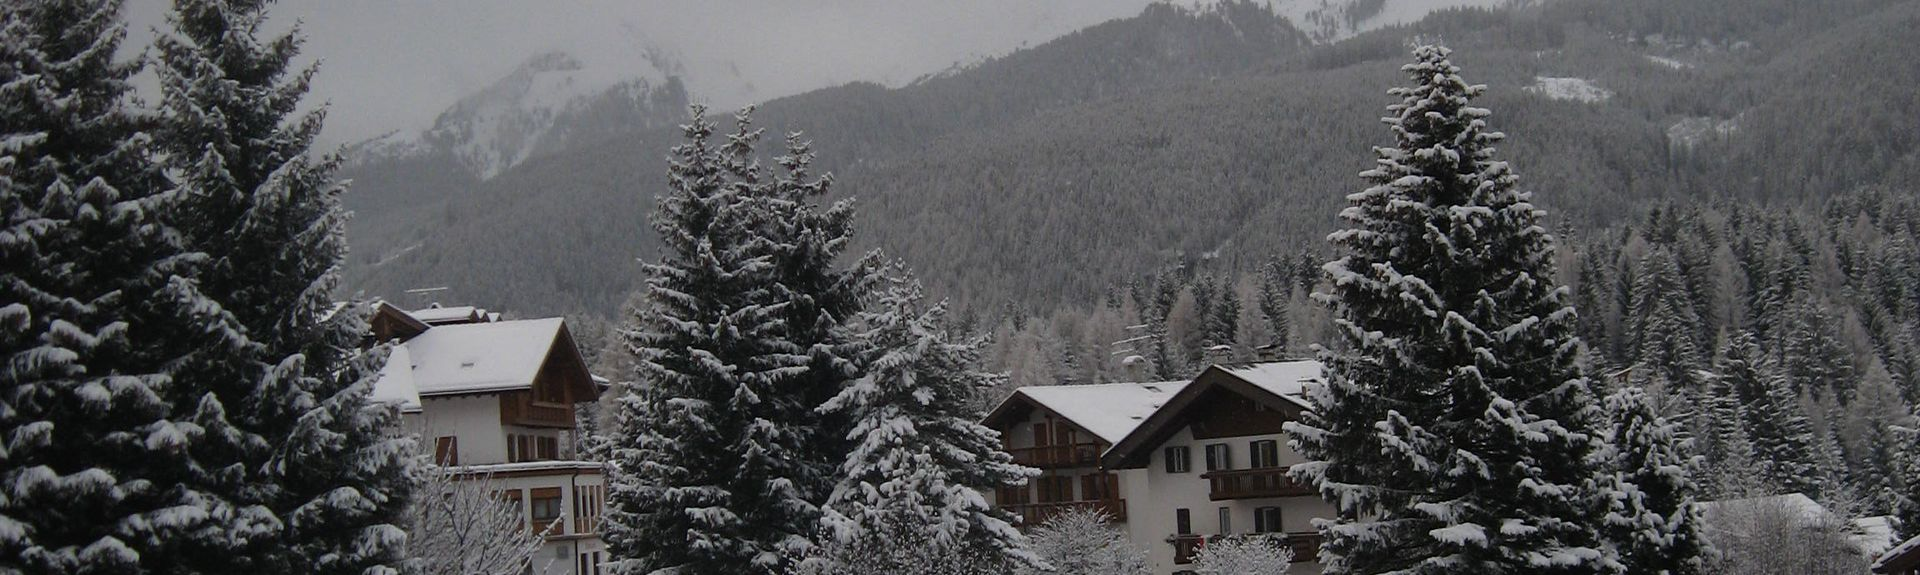 Obereggen, Nova Ponente, Trentino-Zuid-Tirol, Italië